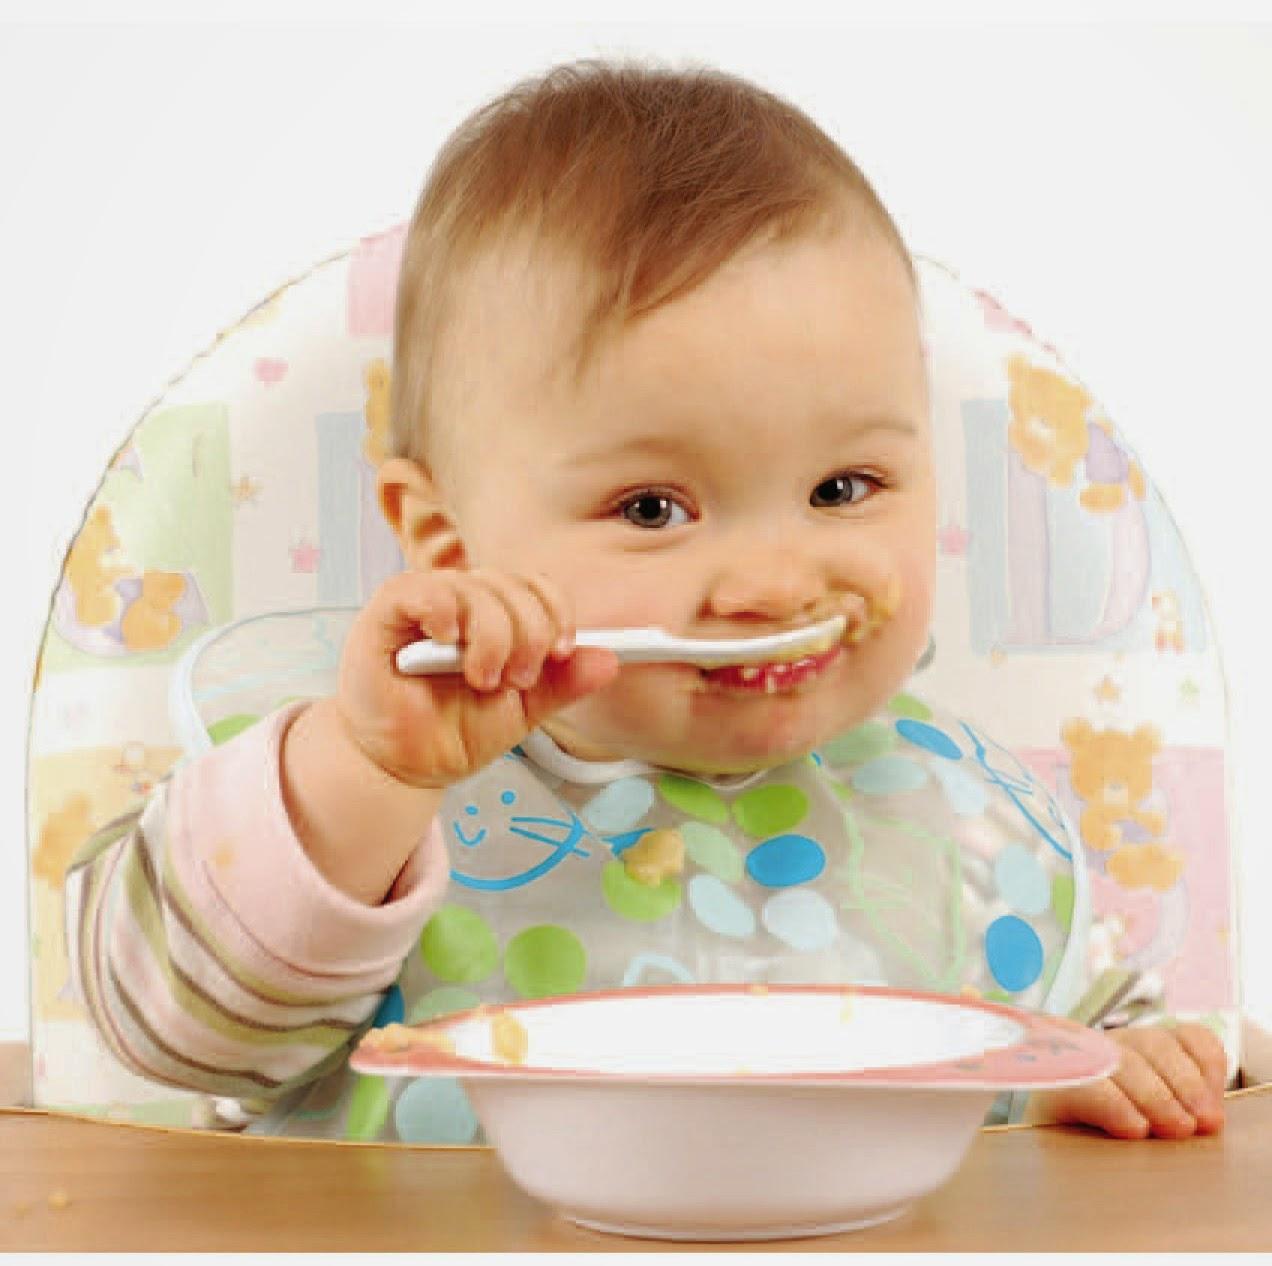 Makanan pendamping ASI pertama kali yang diberikan bayi CARA MEMBERIKAN MAKANAN PENDAMPING ASI PADA BAYI